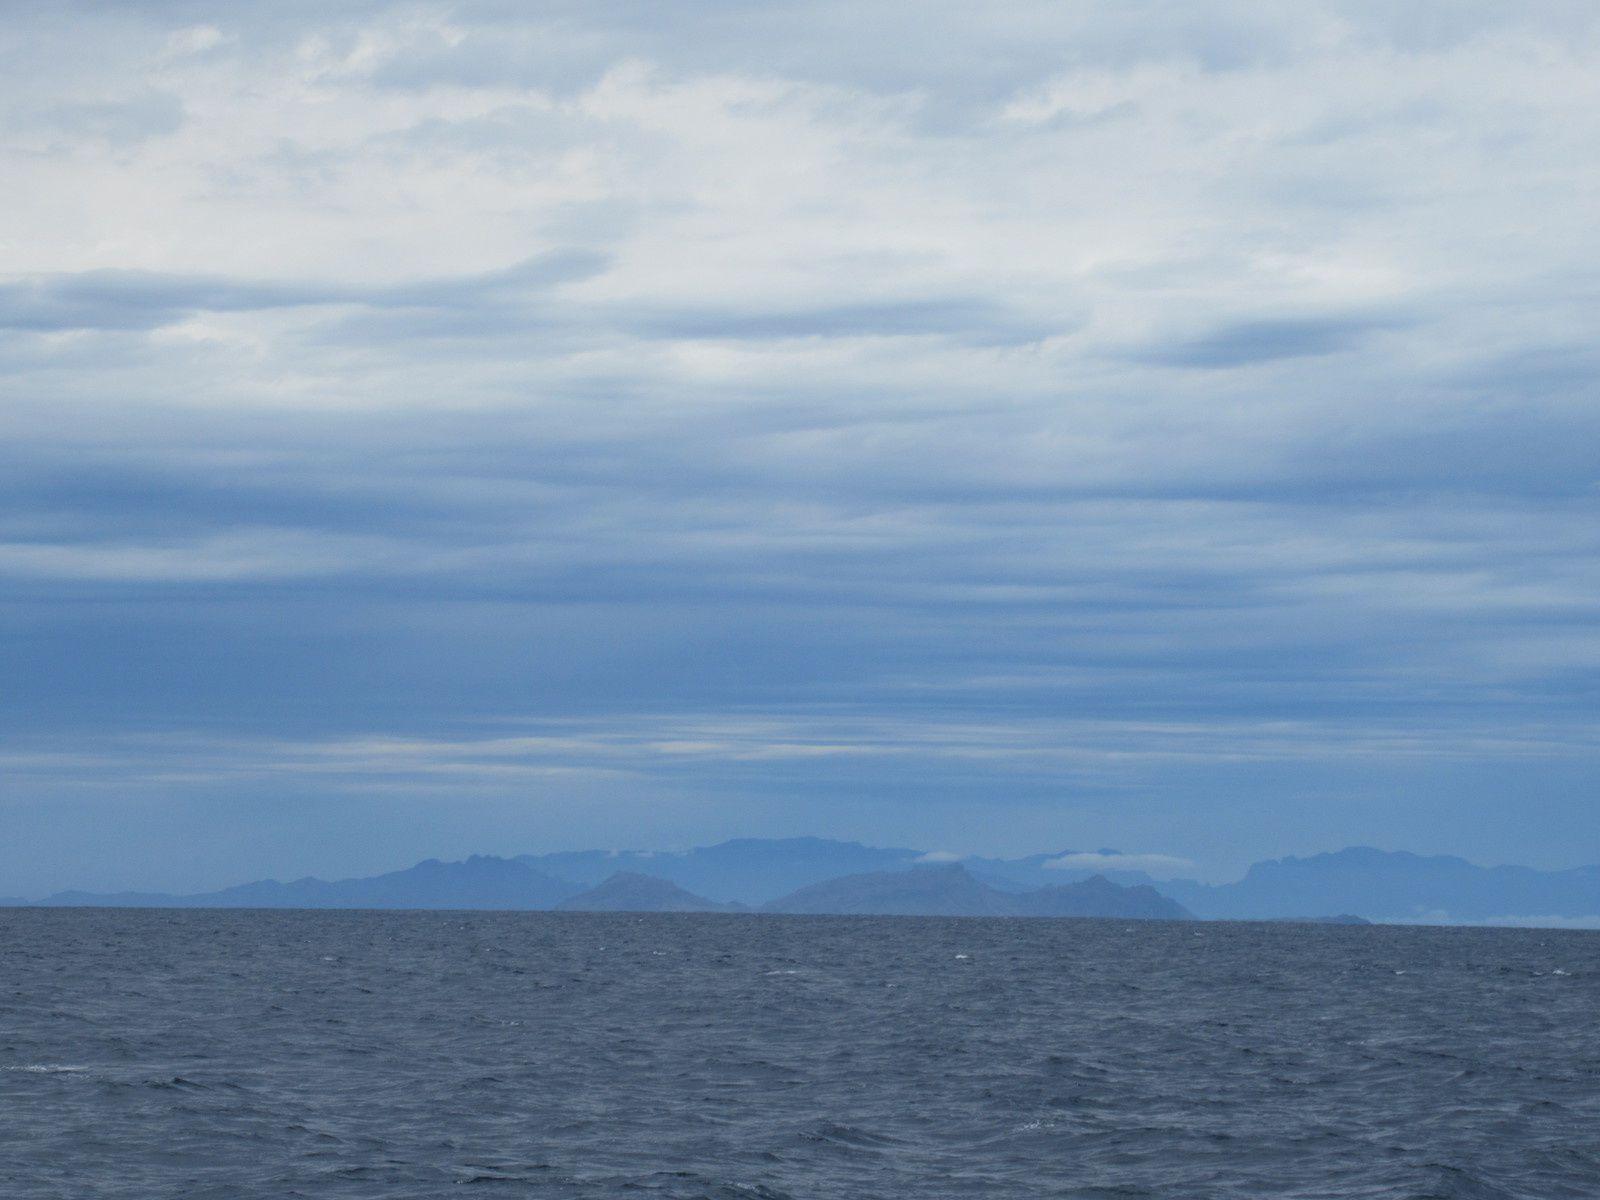 En route vers l'Ilha de Santa Luzia